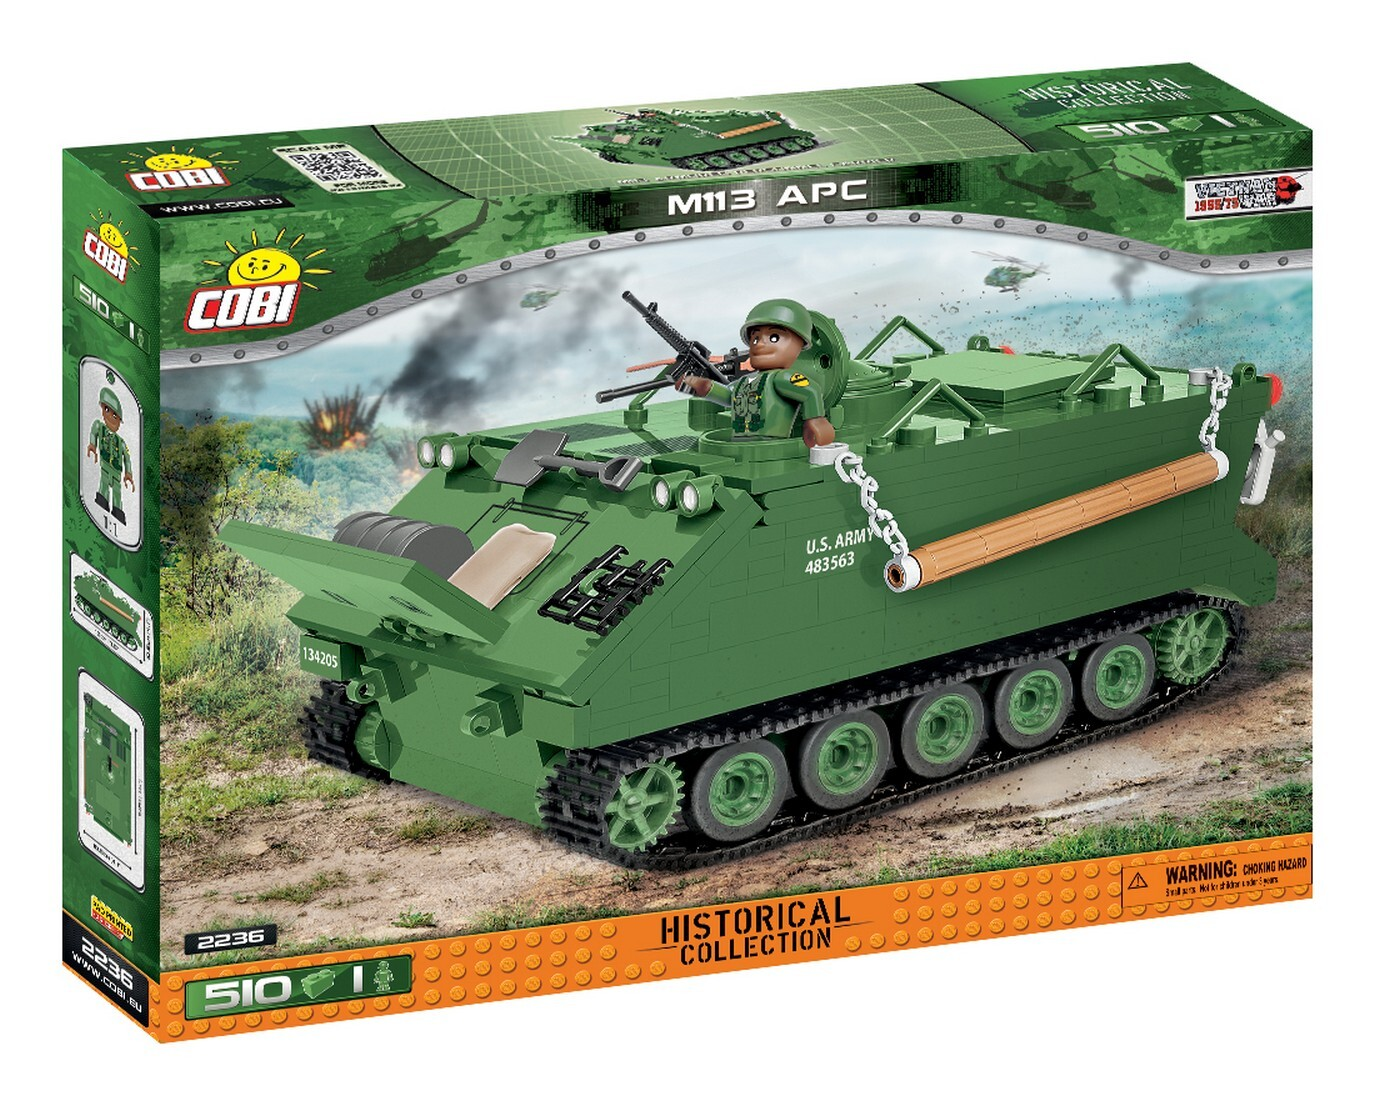 COBI #2236 M113装甲兵員輸送車